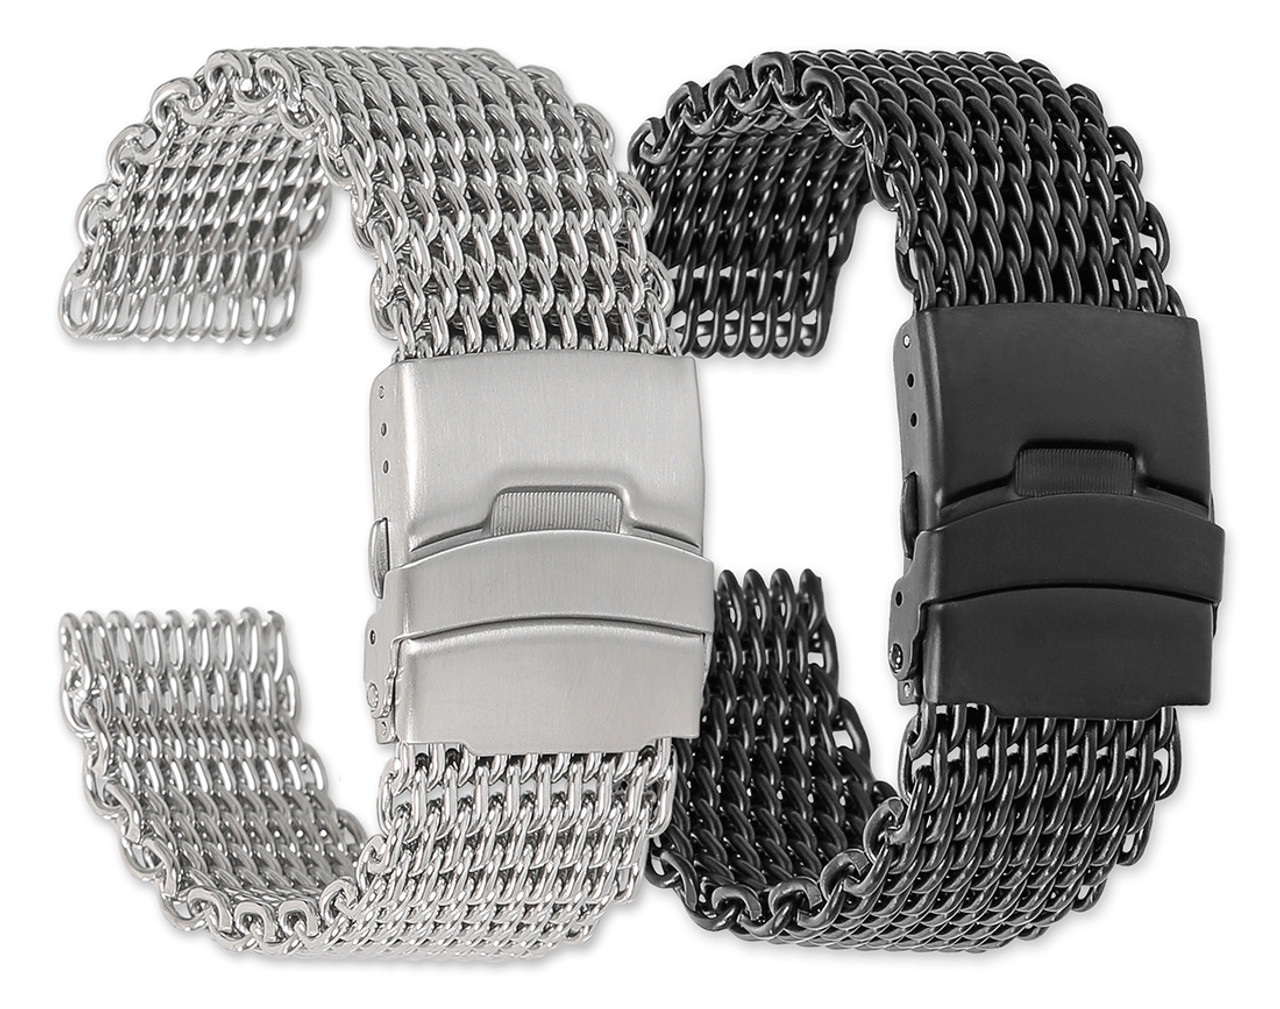 084b3fa3068 Shark Mesh Metal Replacement Watch Band